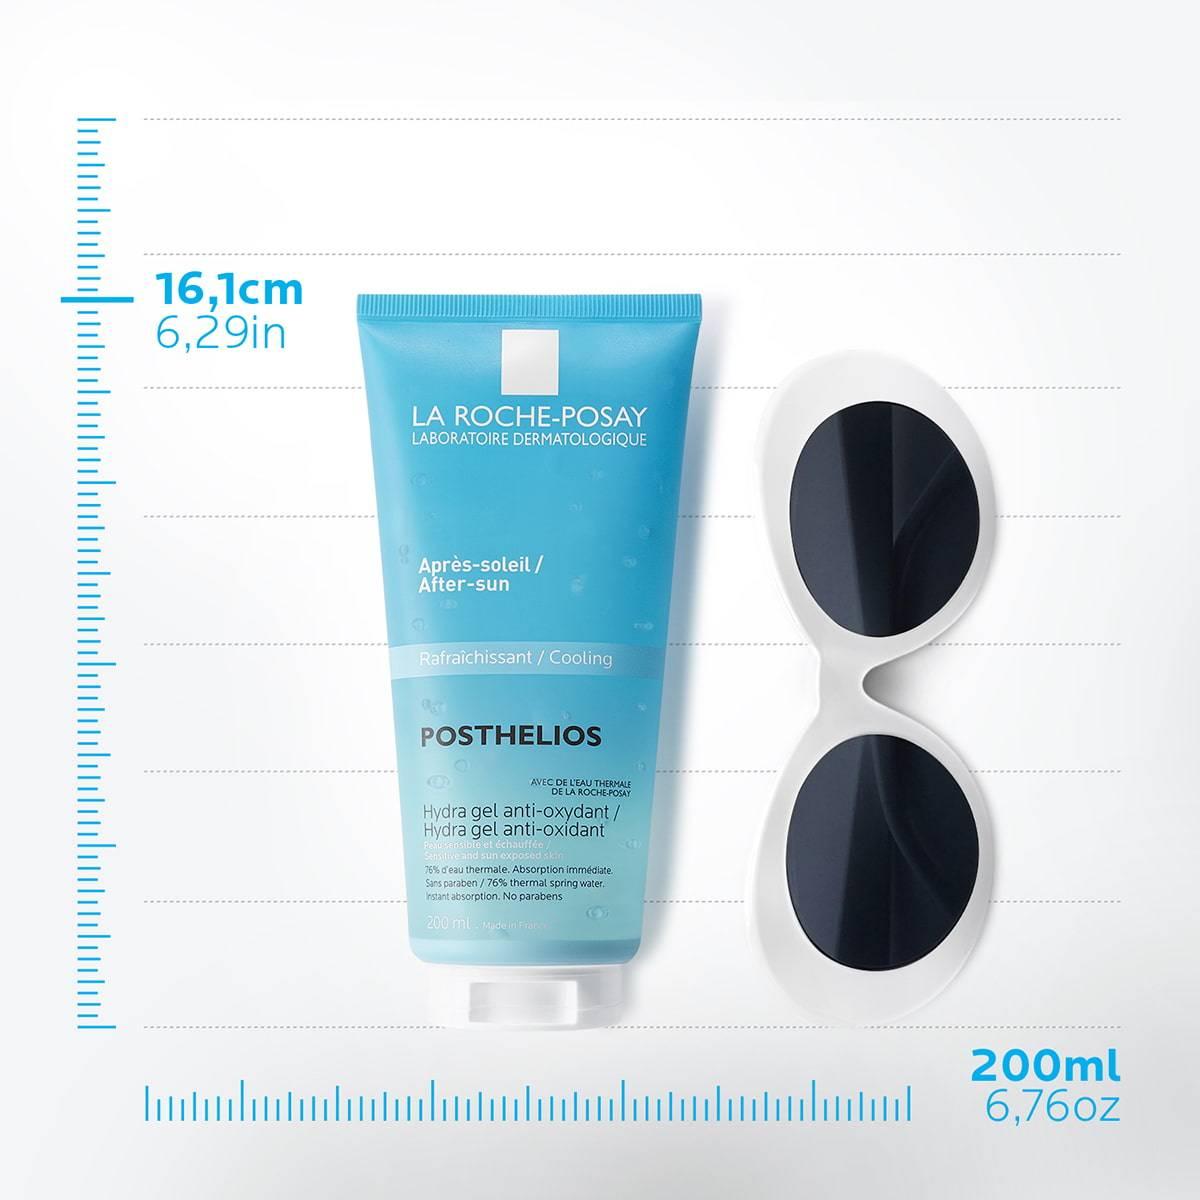 La Roche Posay ProduktSide After Sun Posthelios Hydragel 200ml 3337875